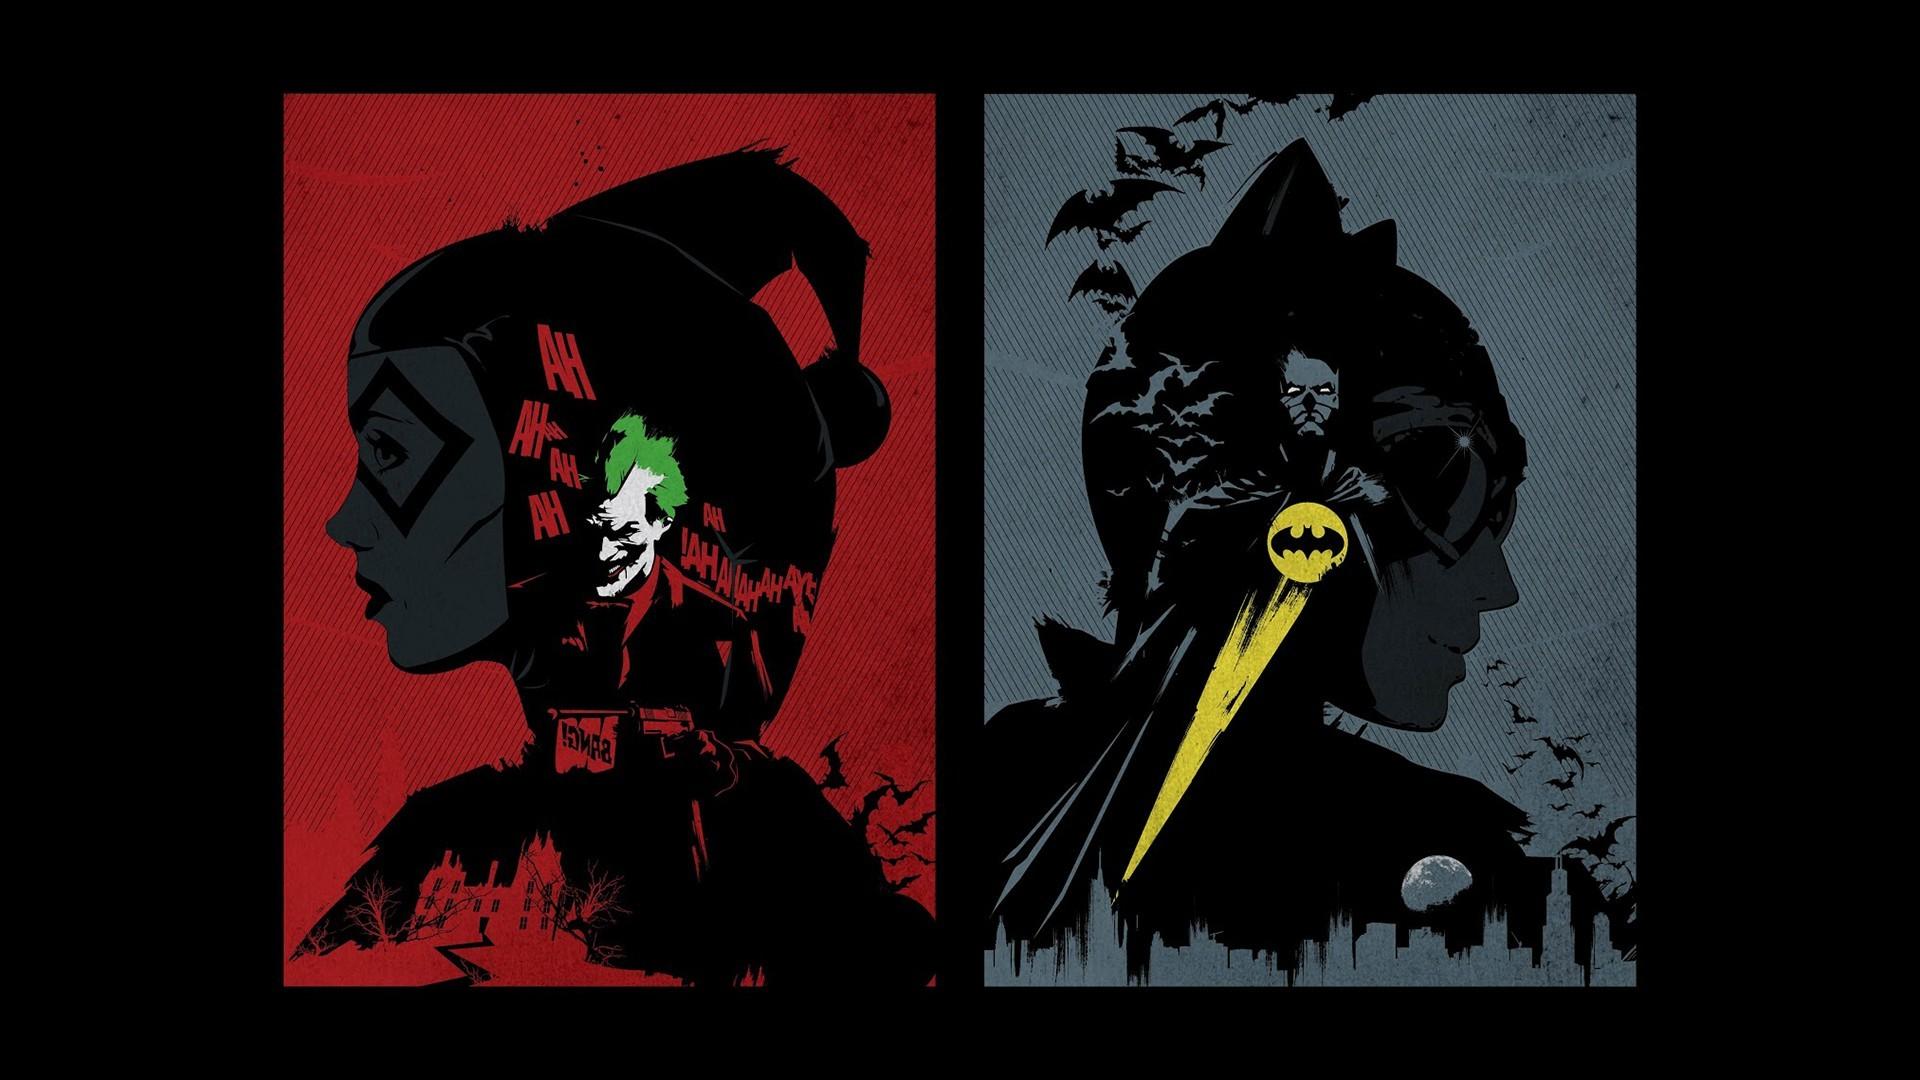 Free Download Dc Comics Batman Catwoman Harley Quinn Wallpapers Hd